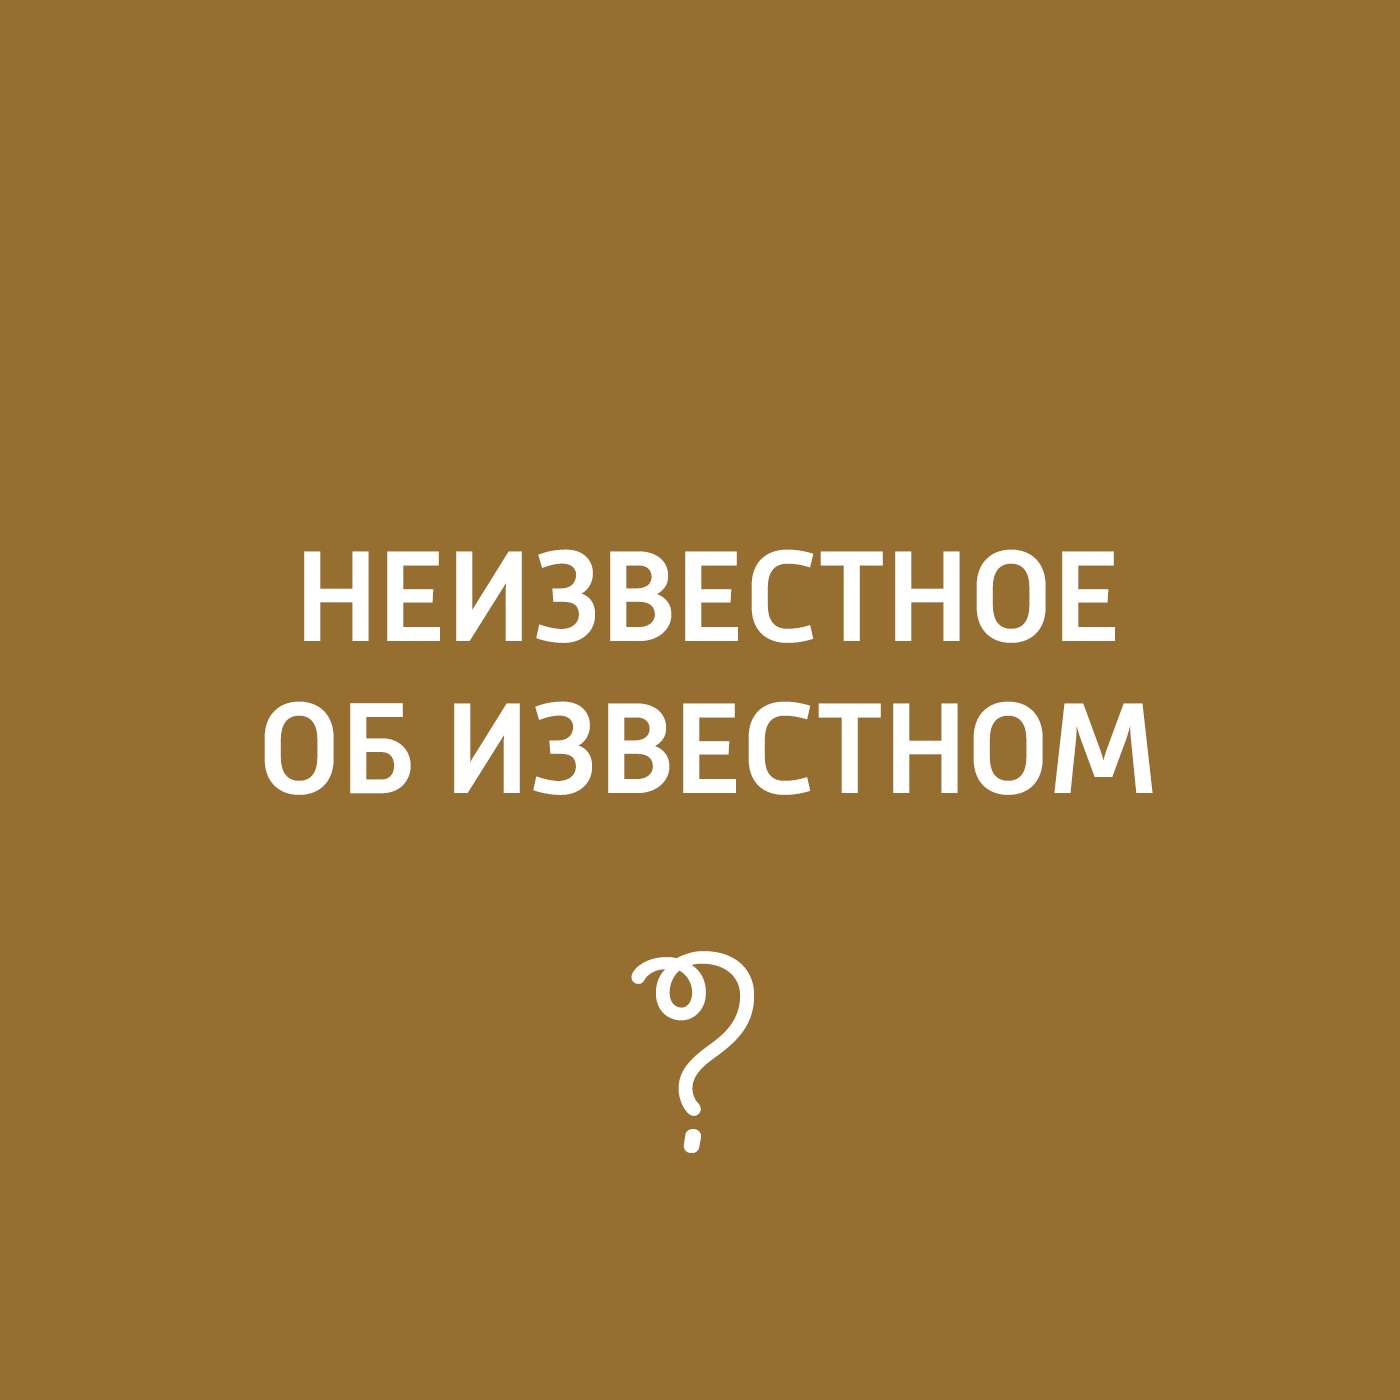 Творческий коллектив программы «Пора домой» Архитектура Бориса Иофана утюг galaxy gl 6107 2800вт керам автооткл